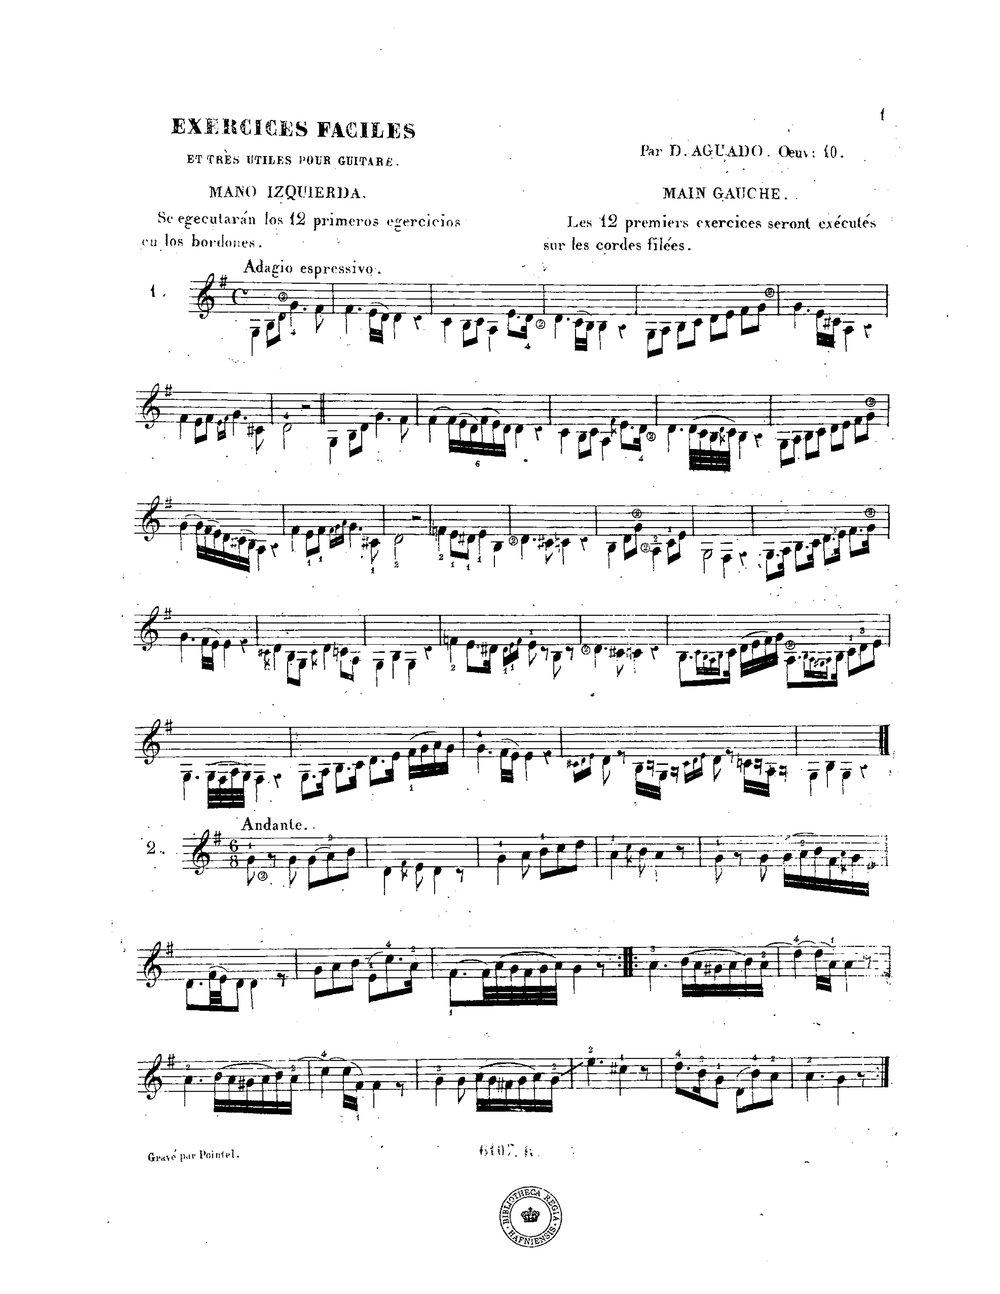 Exercices faciles et très utiles, Op.10 (Aguado, Dionisio) 1.jpg